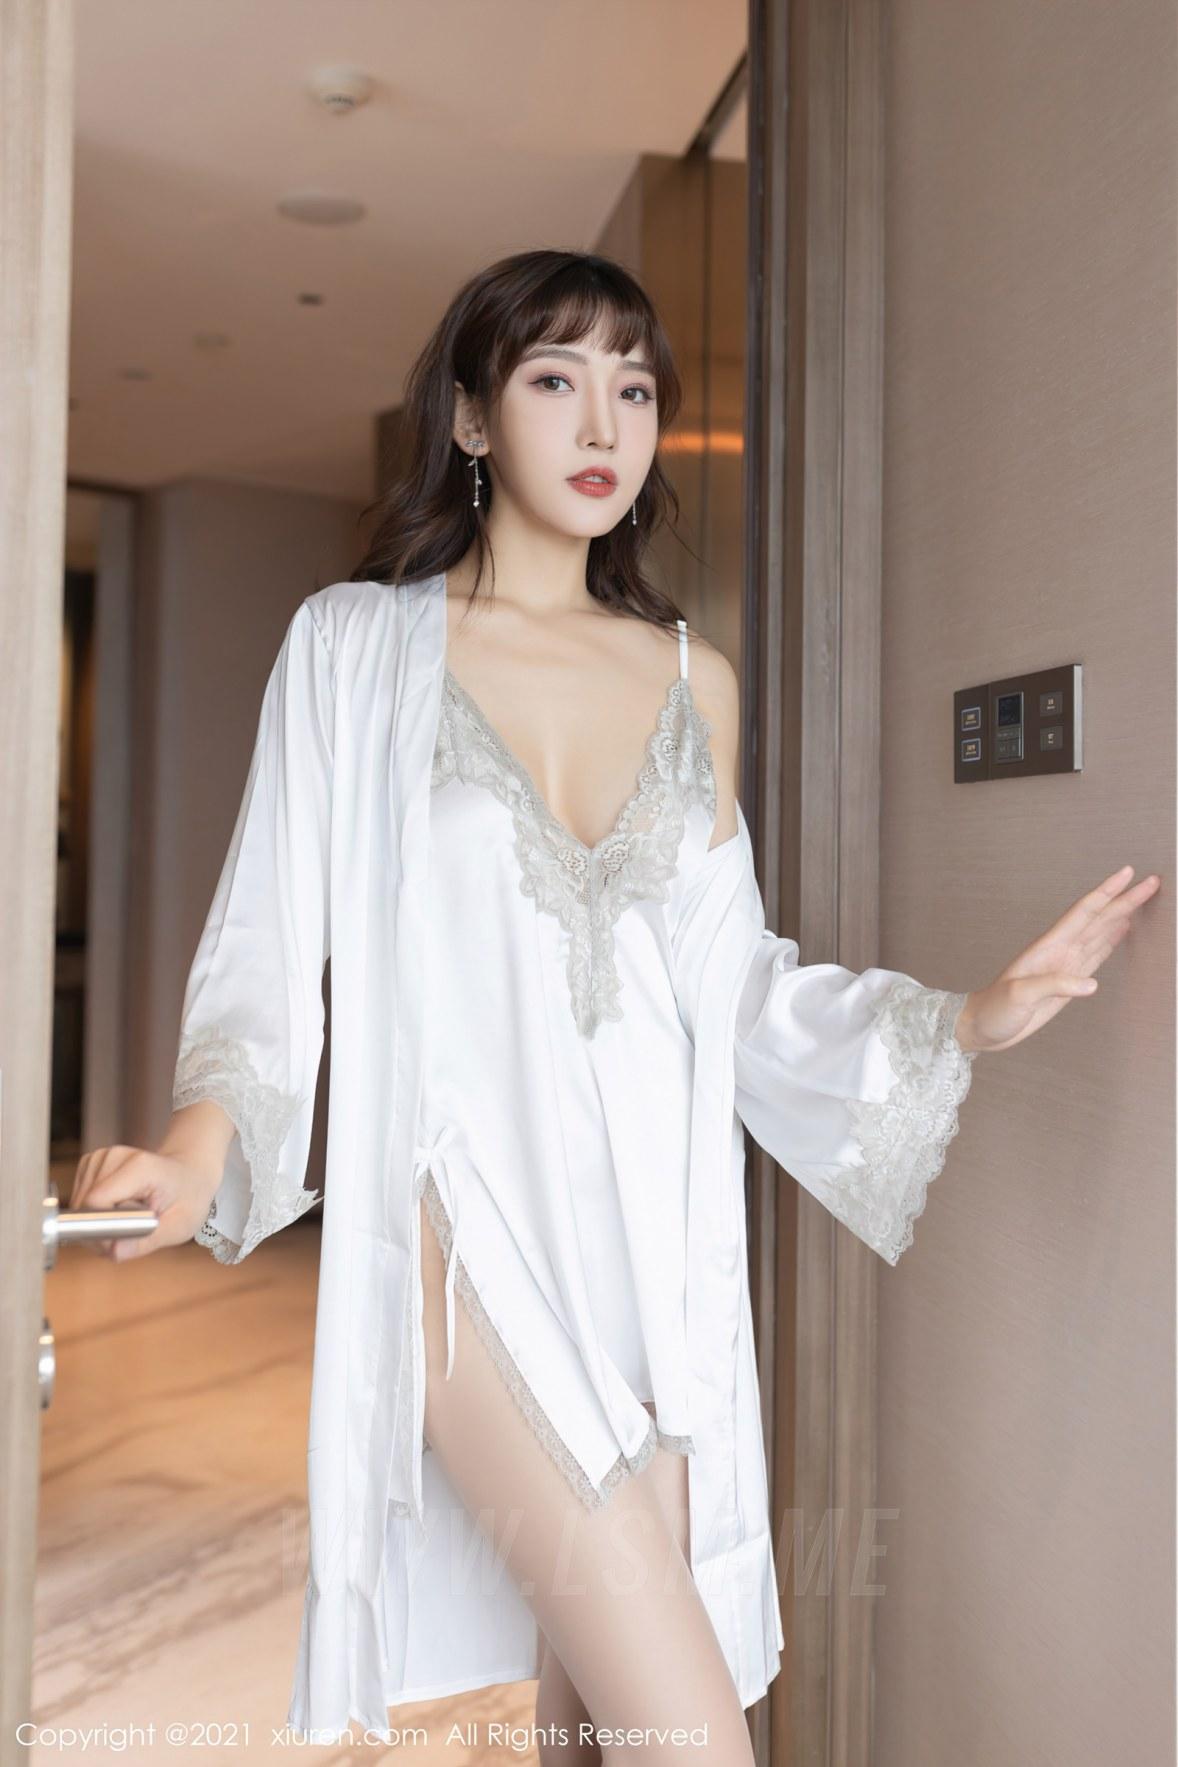 XiuRen 秀人 No.3861 居家睡衣主题 陆萱萱 性感写真11 - 2